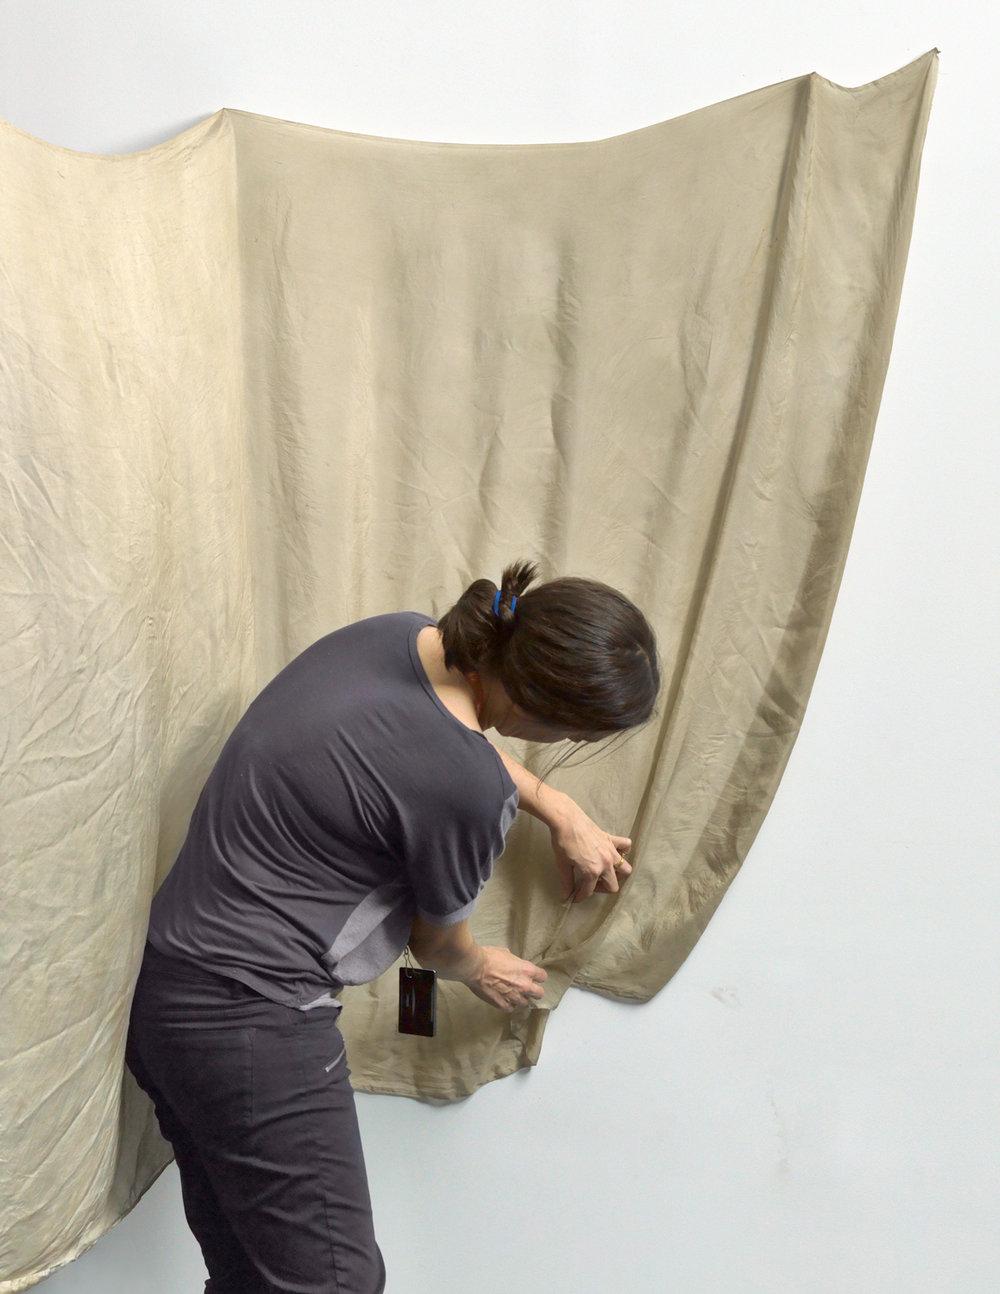 Green cloth after Bale, Siri Hayes, 2017, Inkjet on cotton rag art paper, 58 x 75cm